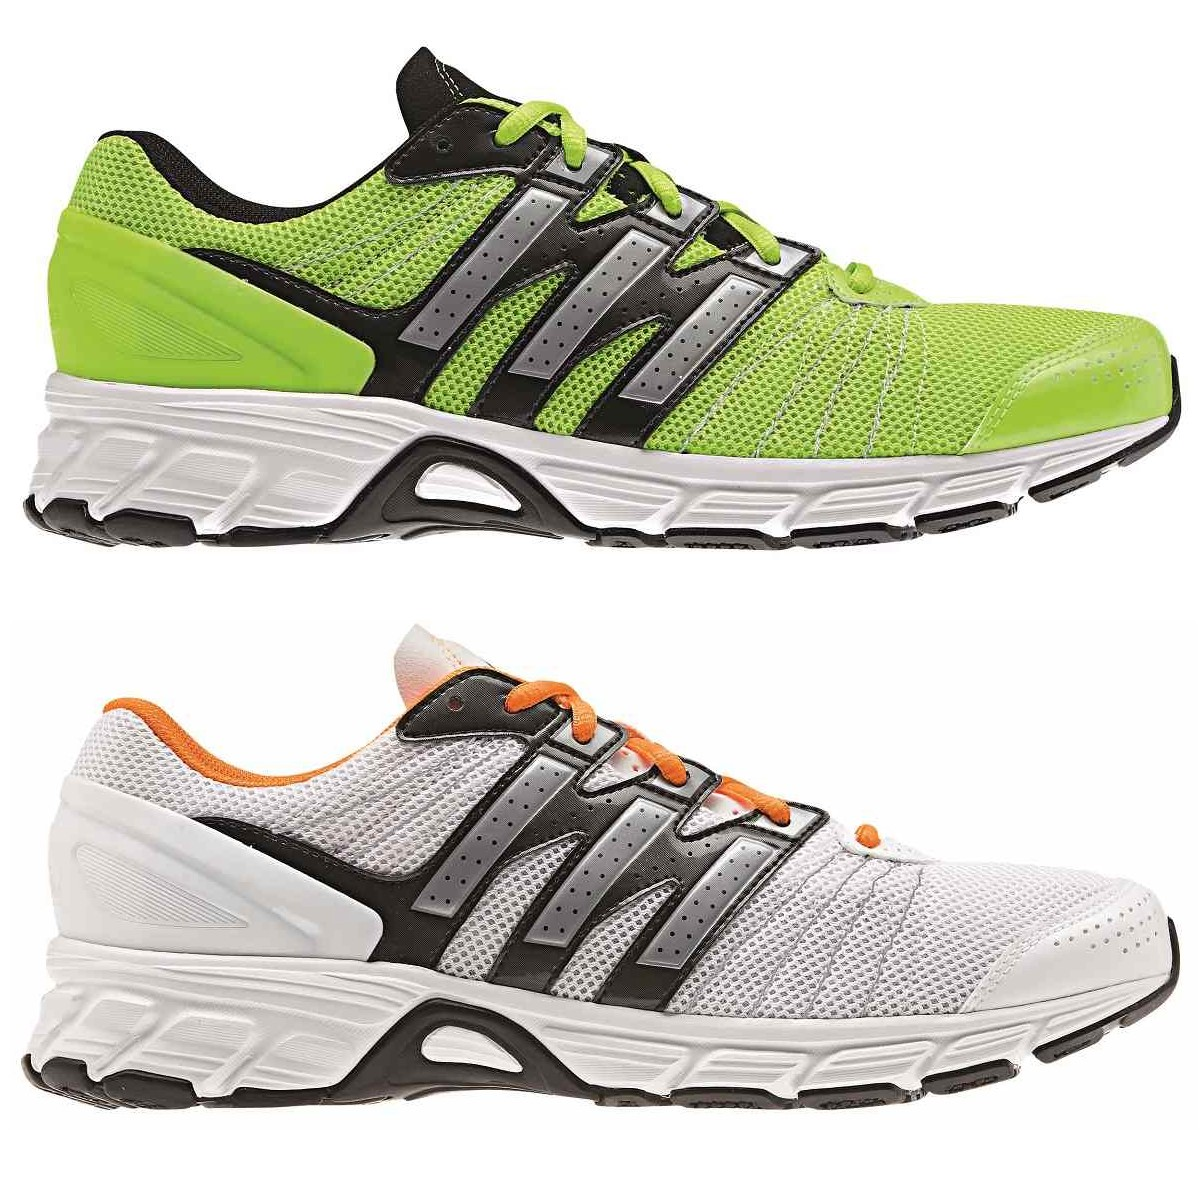 1b005f207bbea4 Das Bild wird geladen Adidas-Roadmace-M-Schuhe-Laufschuhe-Joggingschuhe- Sportschuhe-Herren-